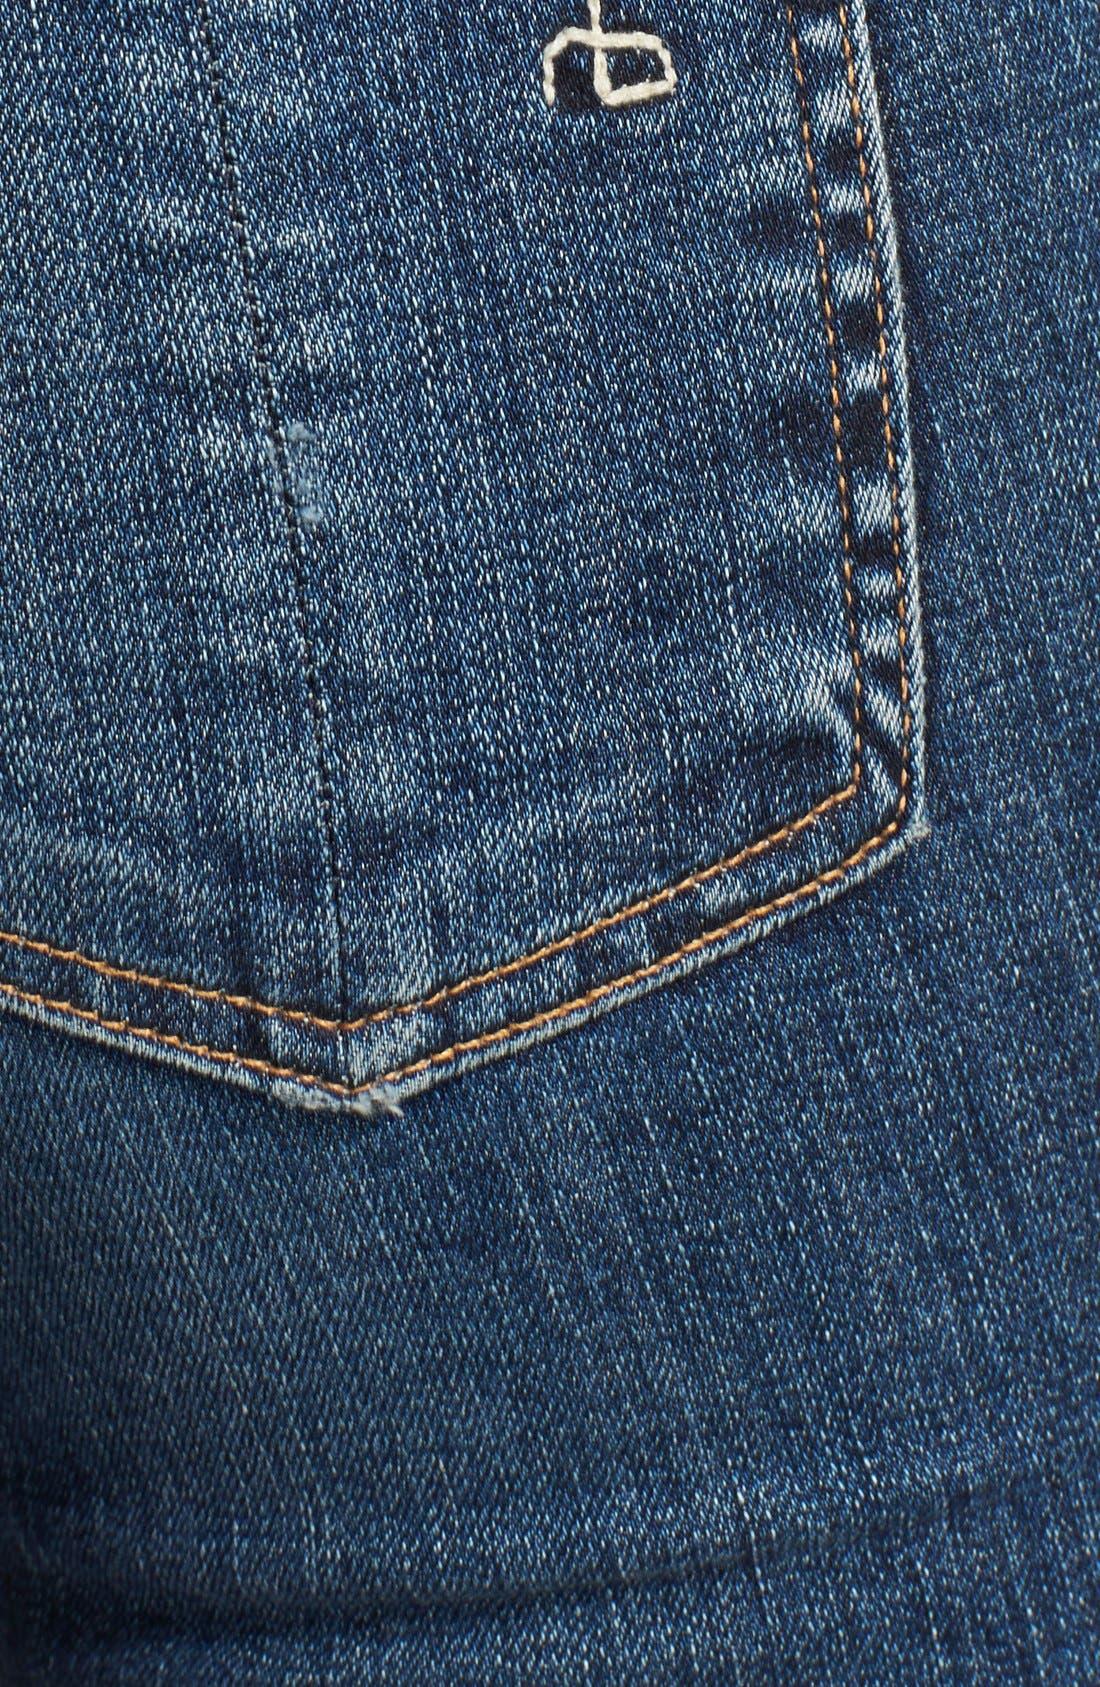 Alternate Image 3  - rag & bone/JEAN 'The Skinny' Stretch Jeans (La Paz)